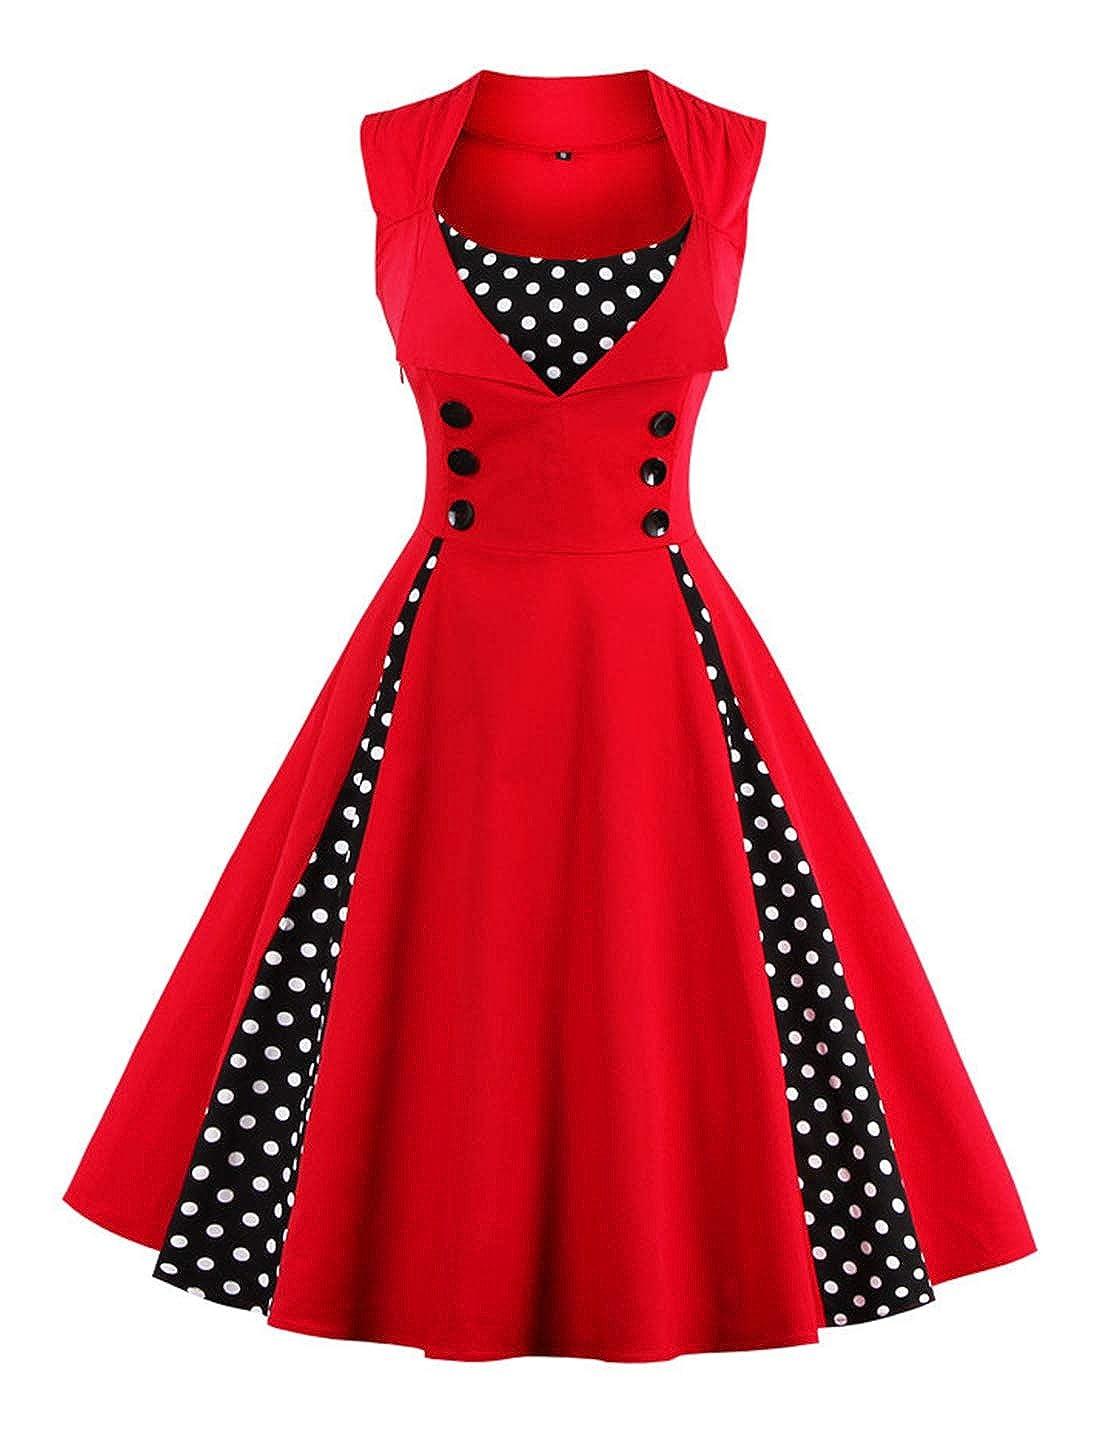 Red Jenkoon Women's Sleeveless Hepburn Polka Dot Retro Vintage Style Cocktail Party Swing Dresses